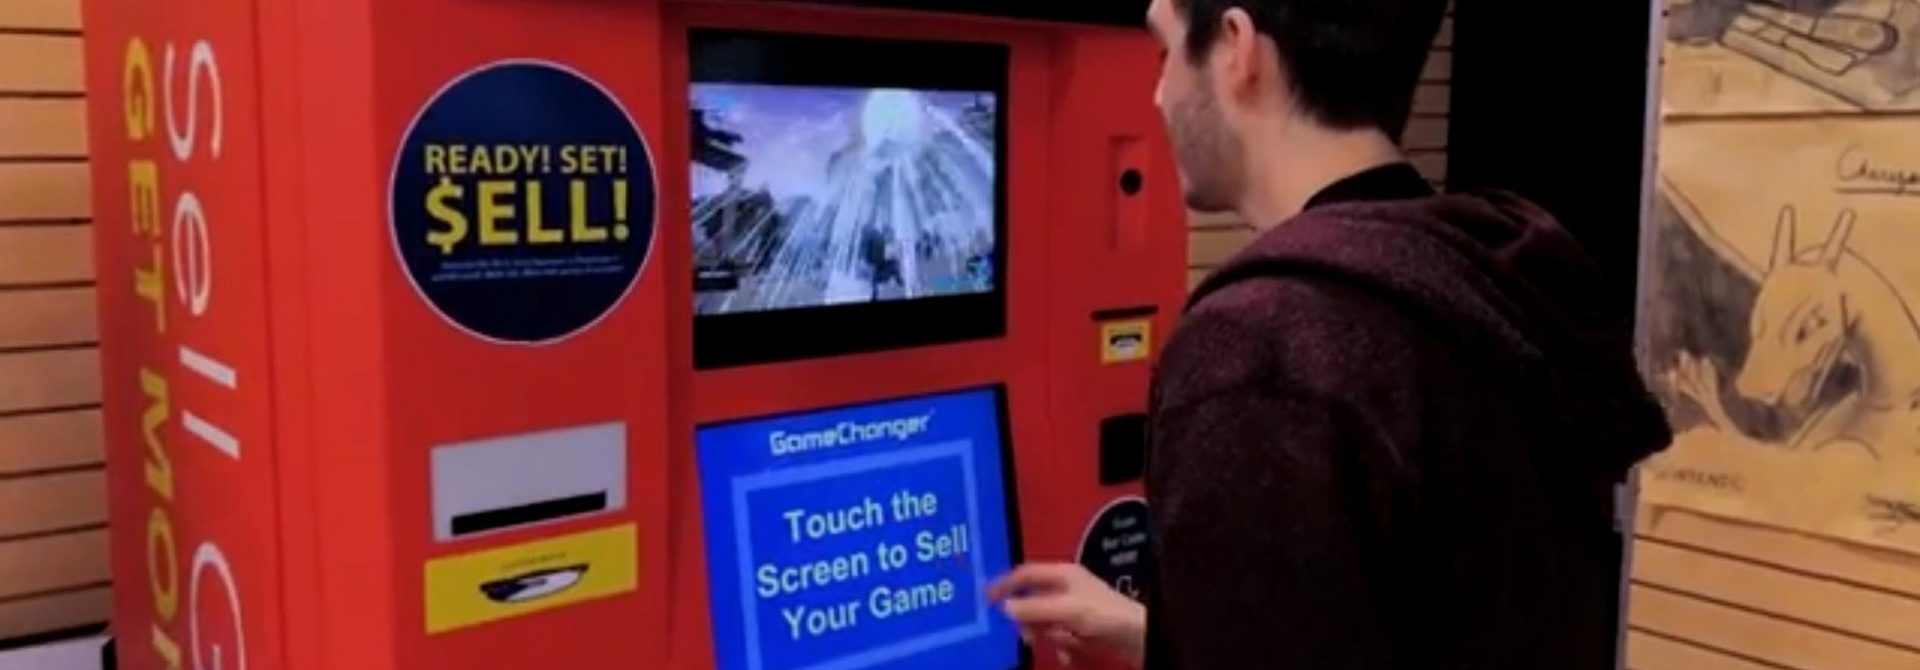 GameChanger Kiosks Seek To Replace The Neighborhood Gamestop